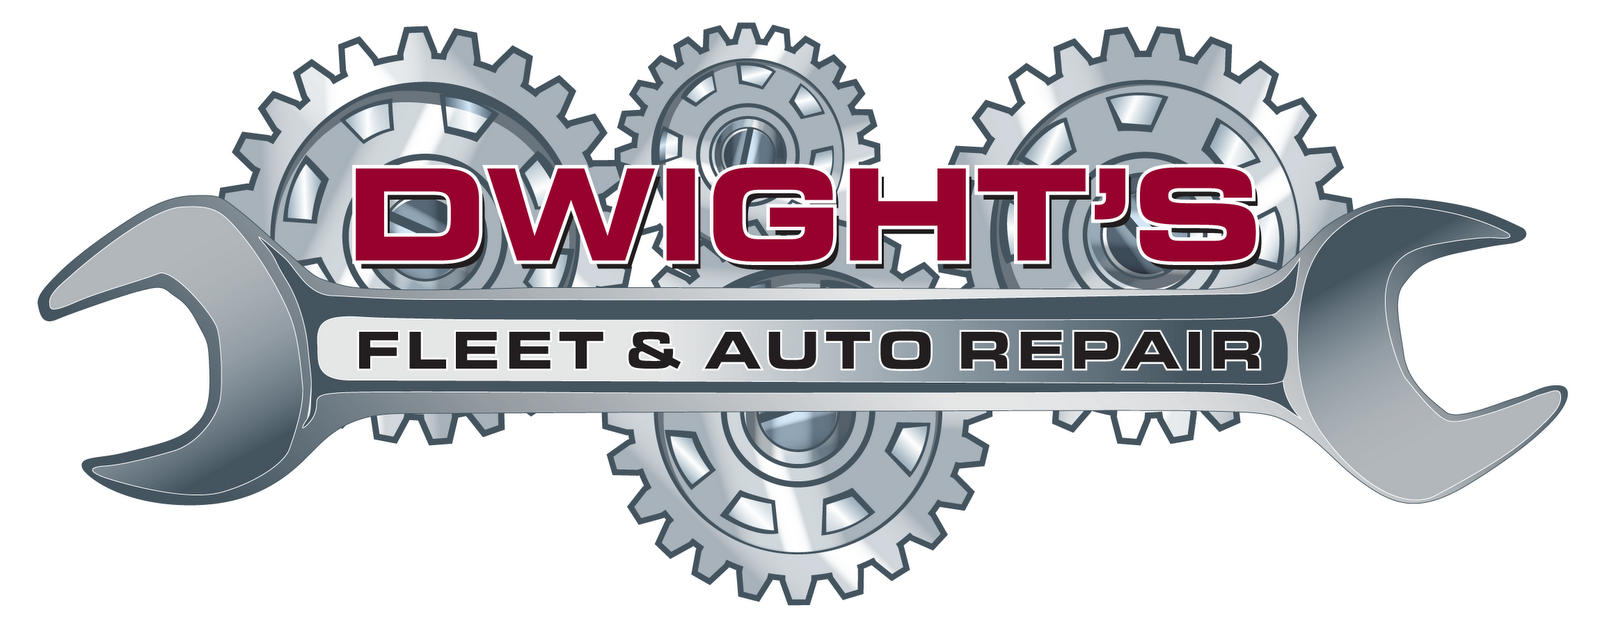 auto mechanic logo ideas